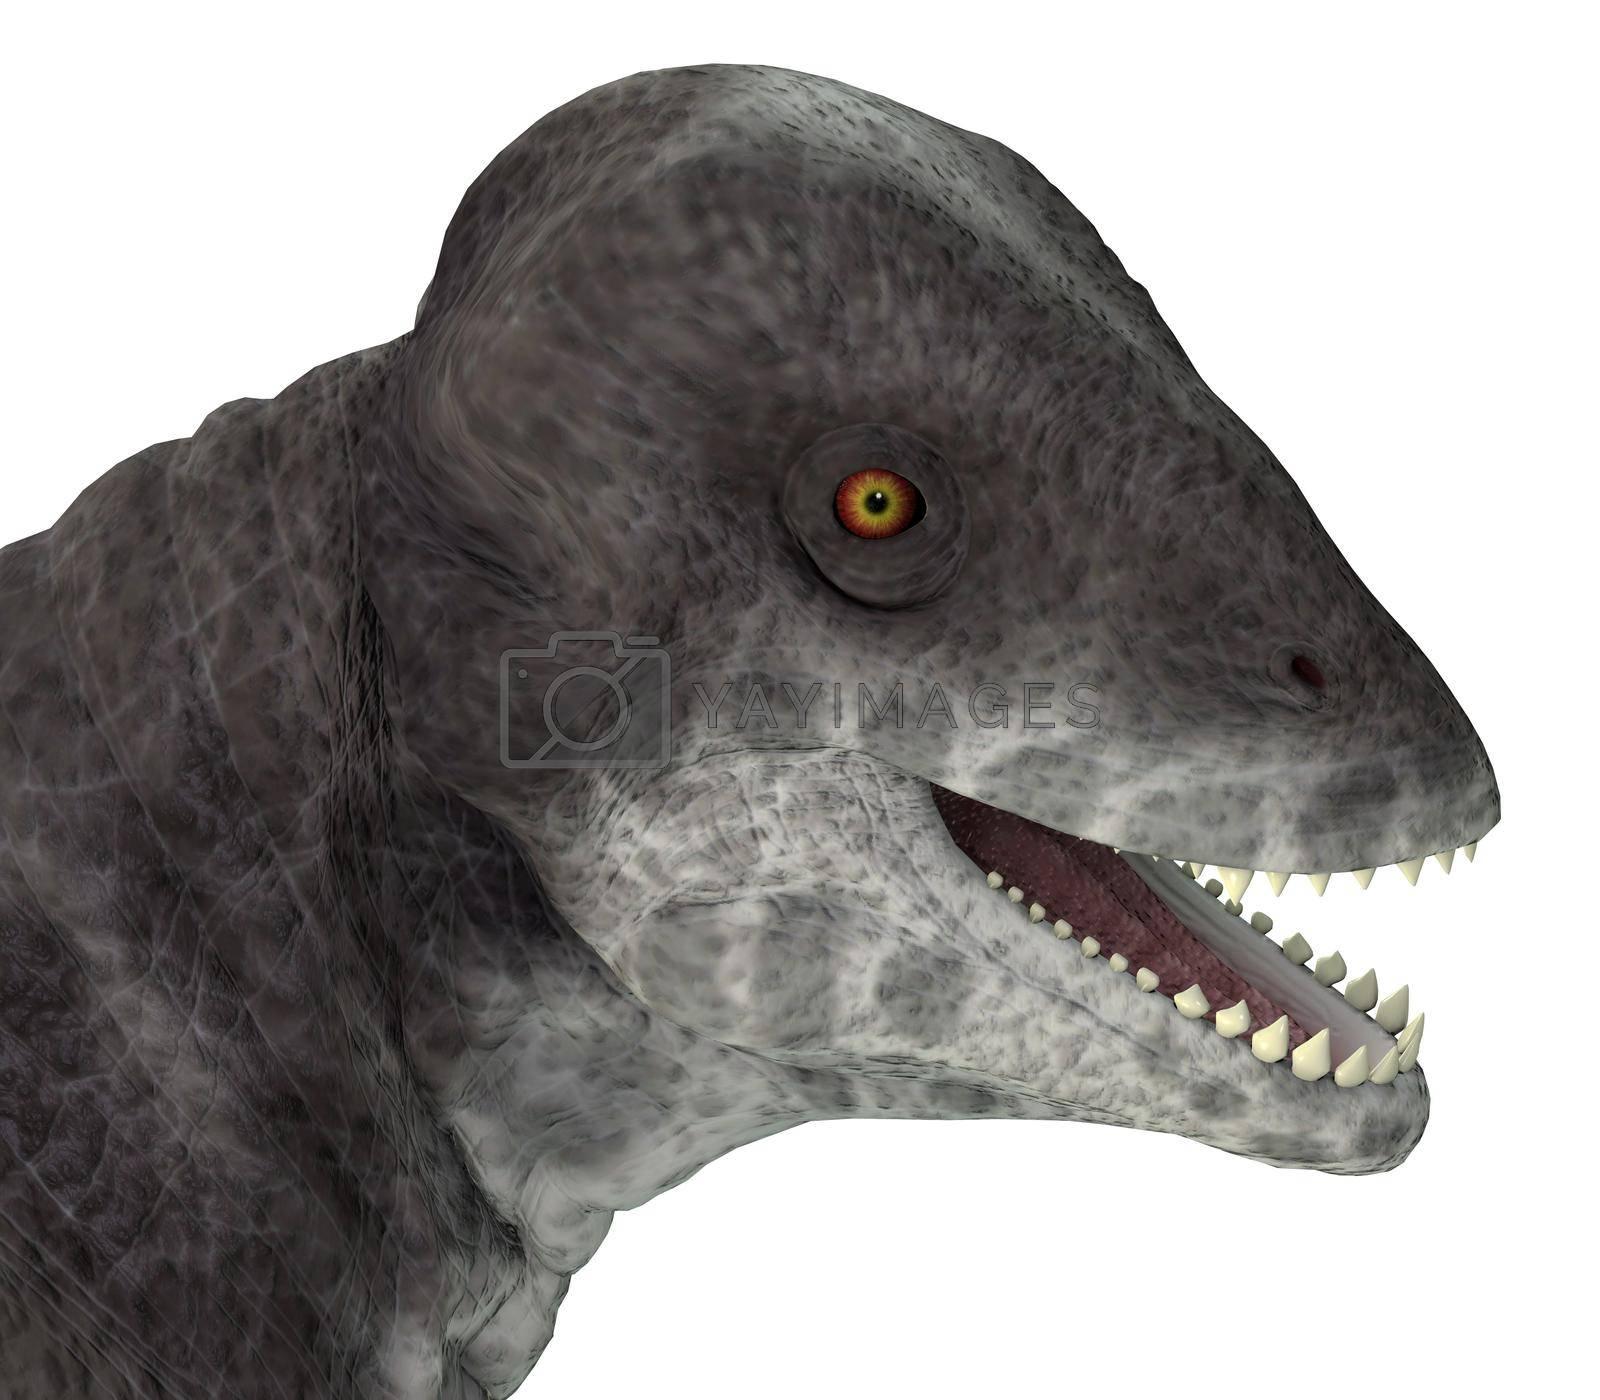 Royalty free image of Criocephalosaurus Dinosaur Head by Catmando